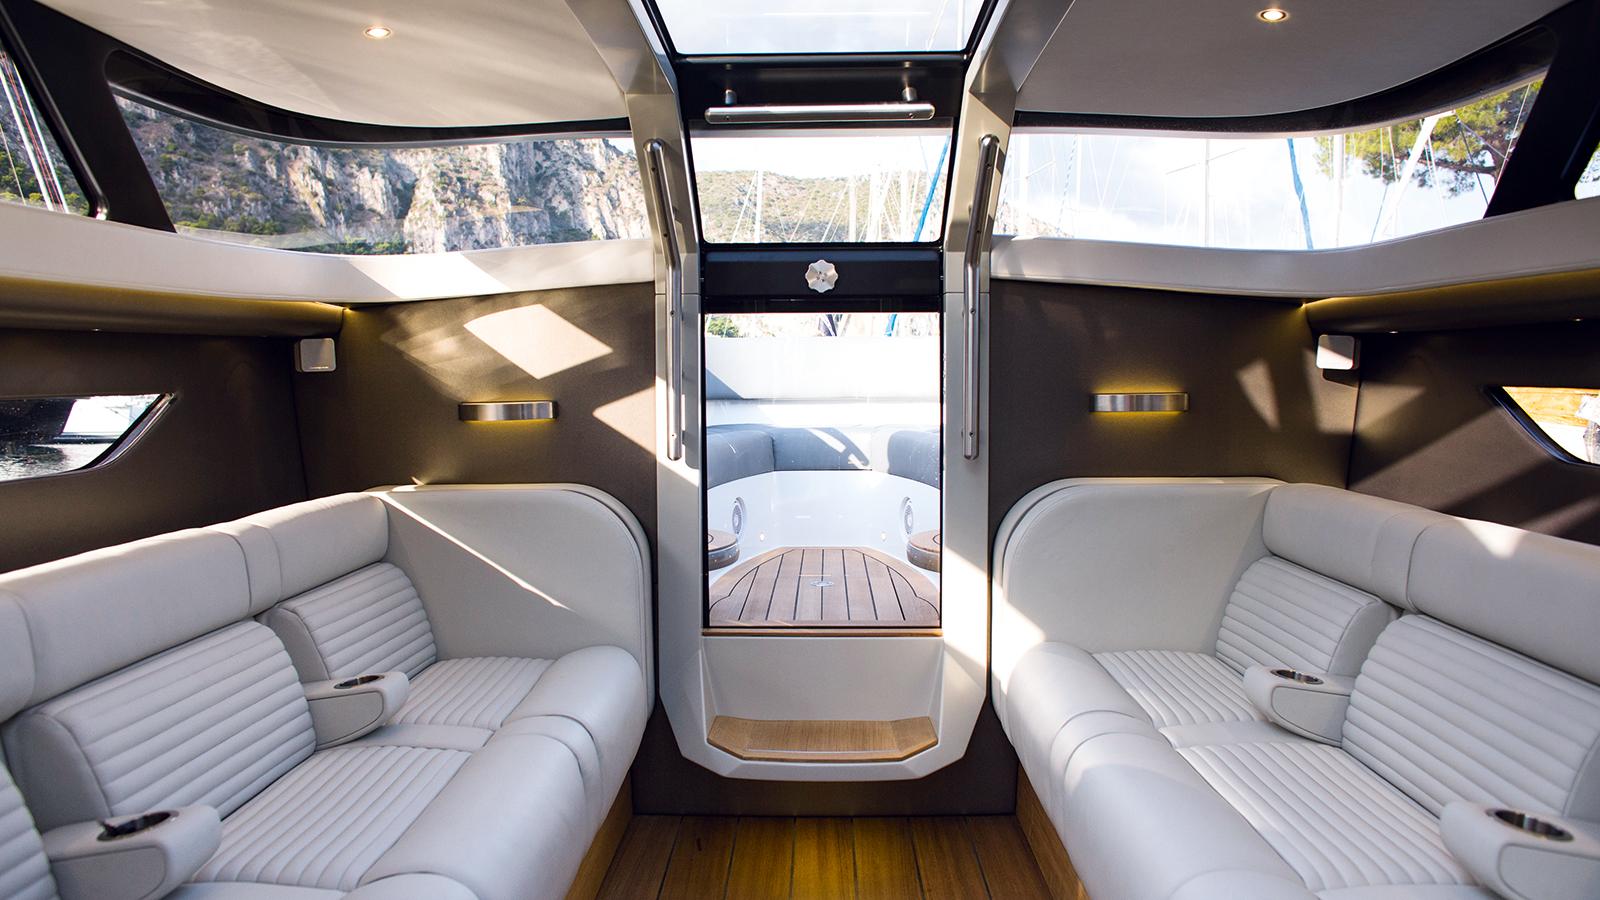 Pascoe Sl Limousine Interior